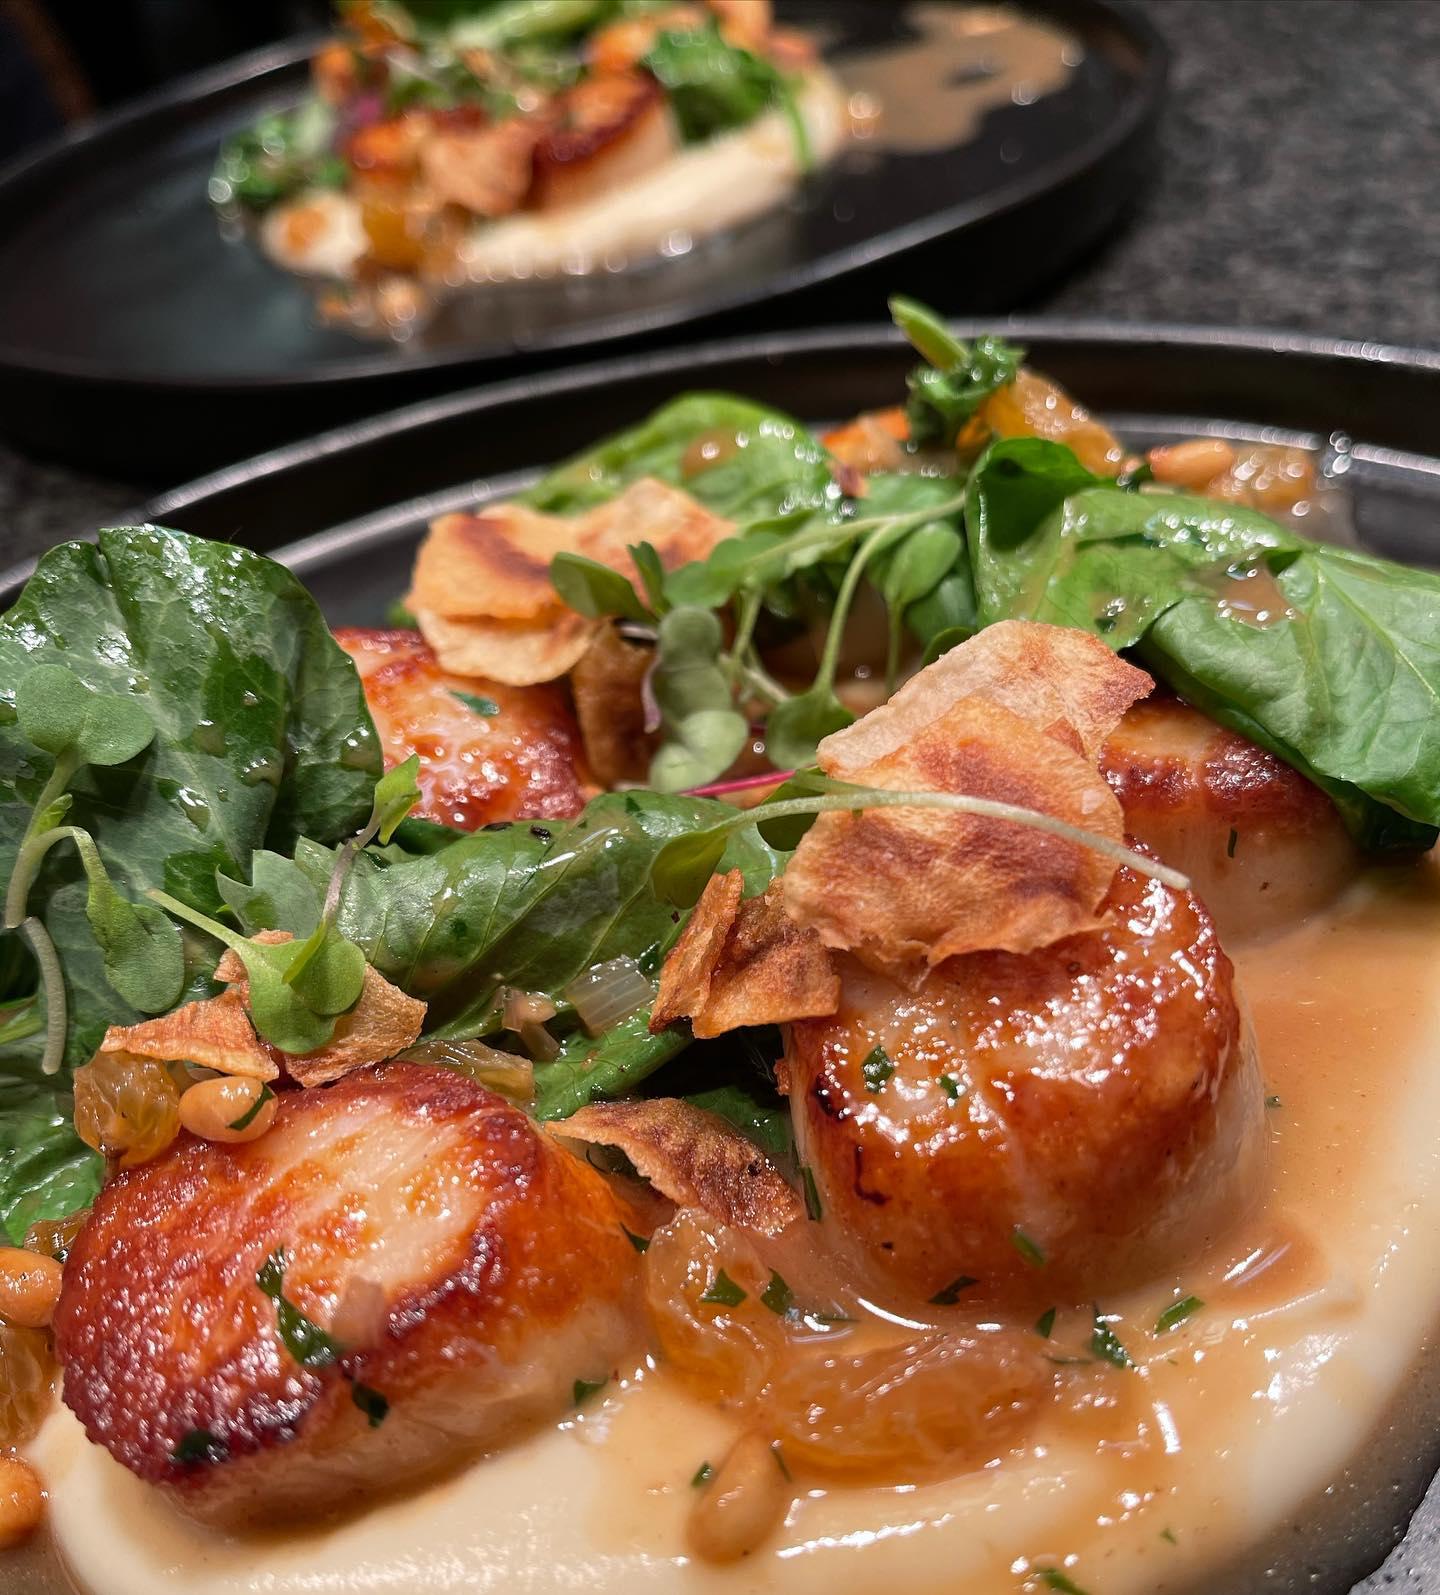 Best Local Restaurants In Shrewsbury Nj Jul 2021 Restaurantji